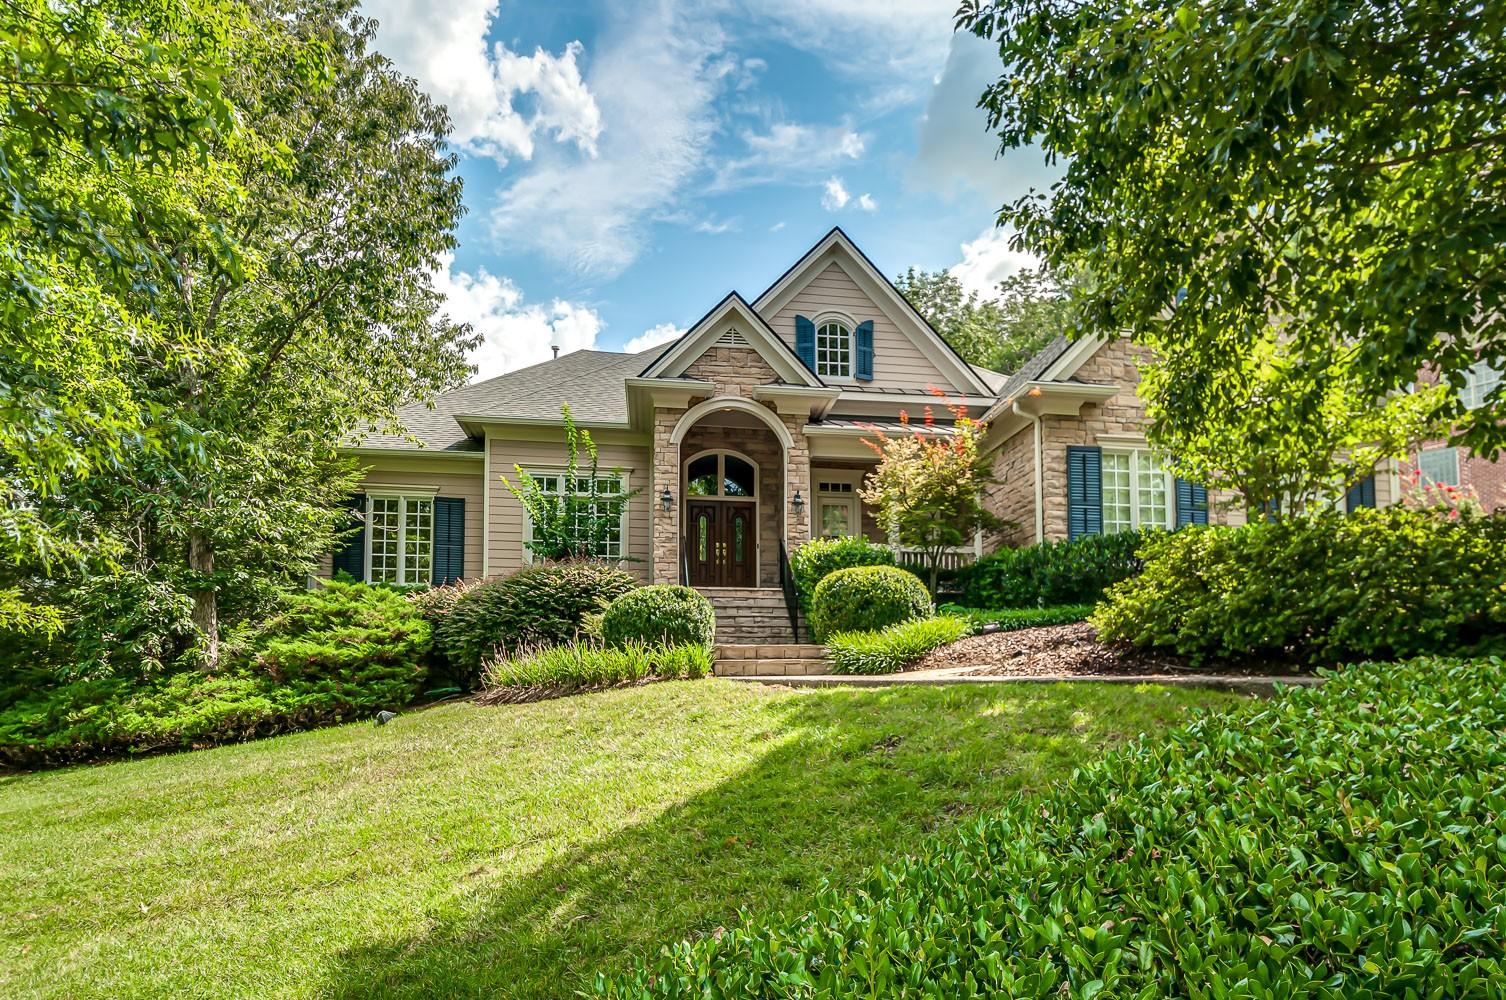 204 Bellegrove Ct Property Photo - Franklin, TN real estate listing